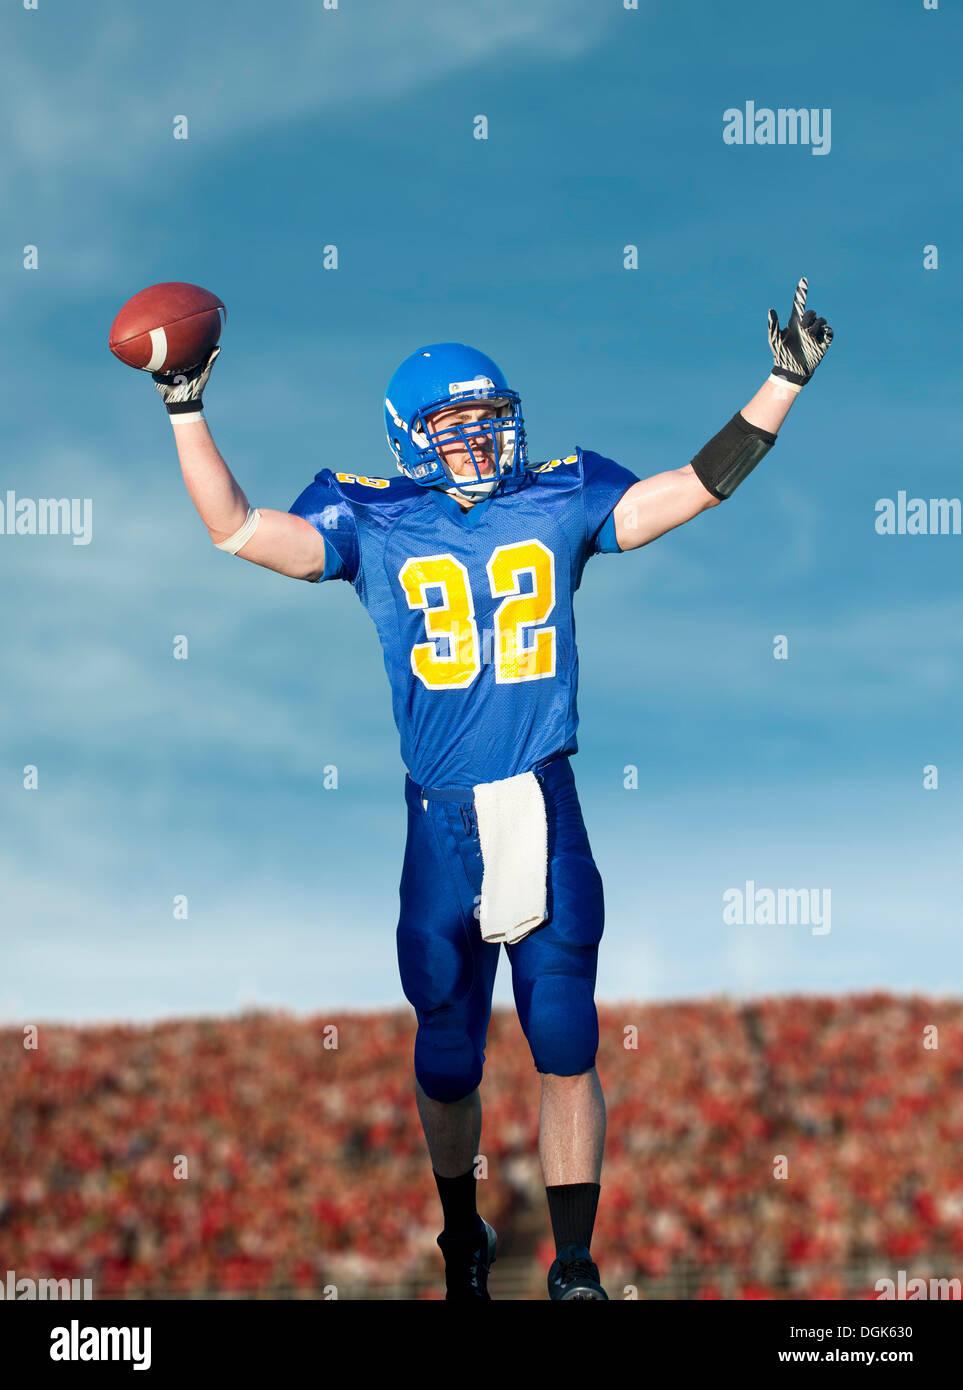 American footballer holding ball - Stock Image